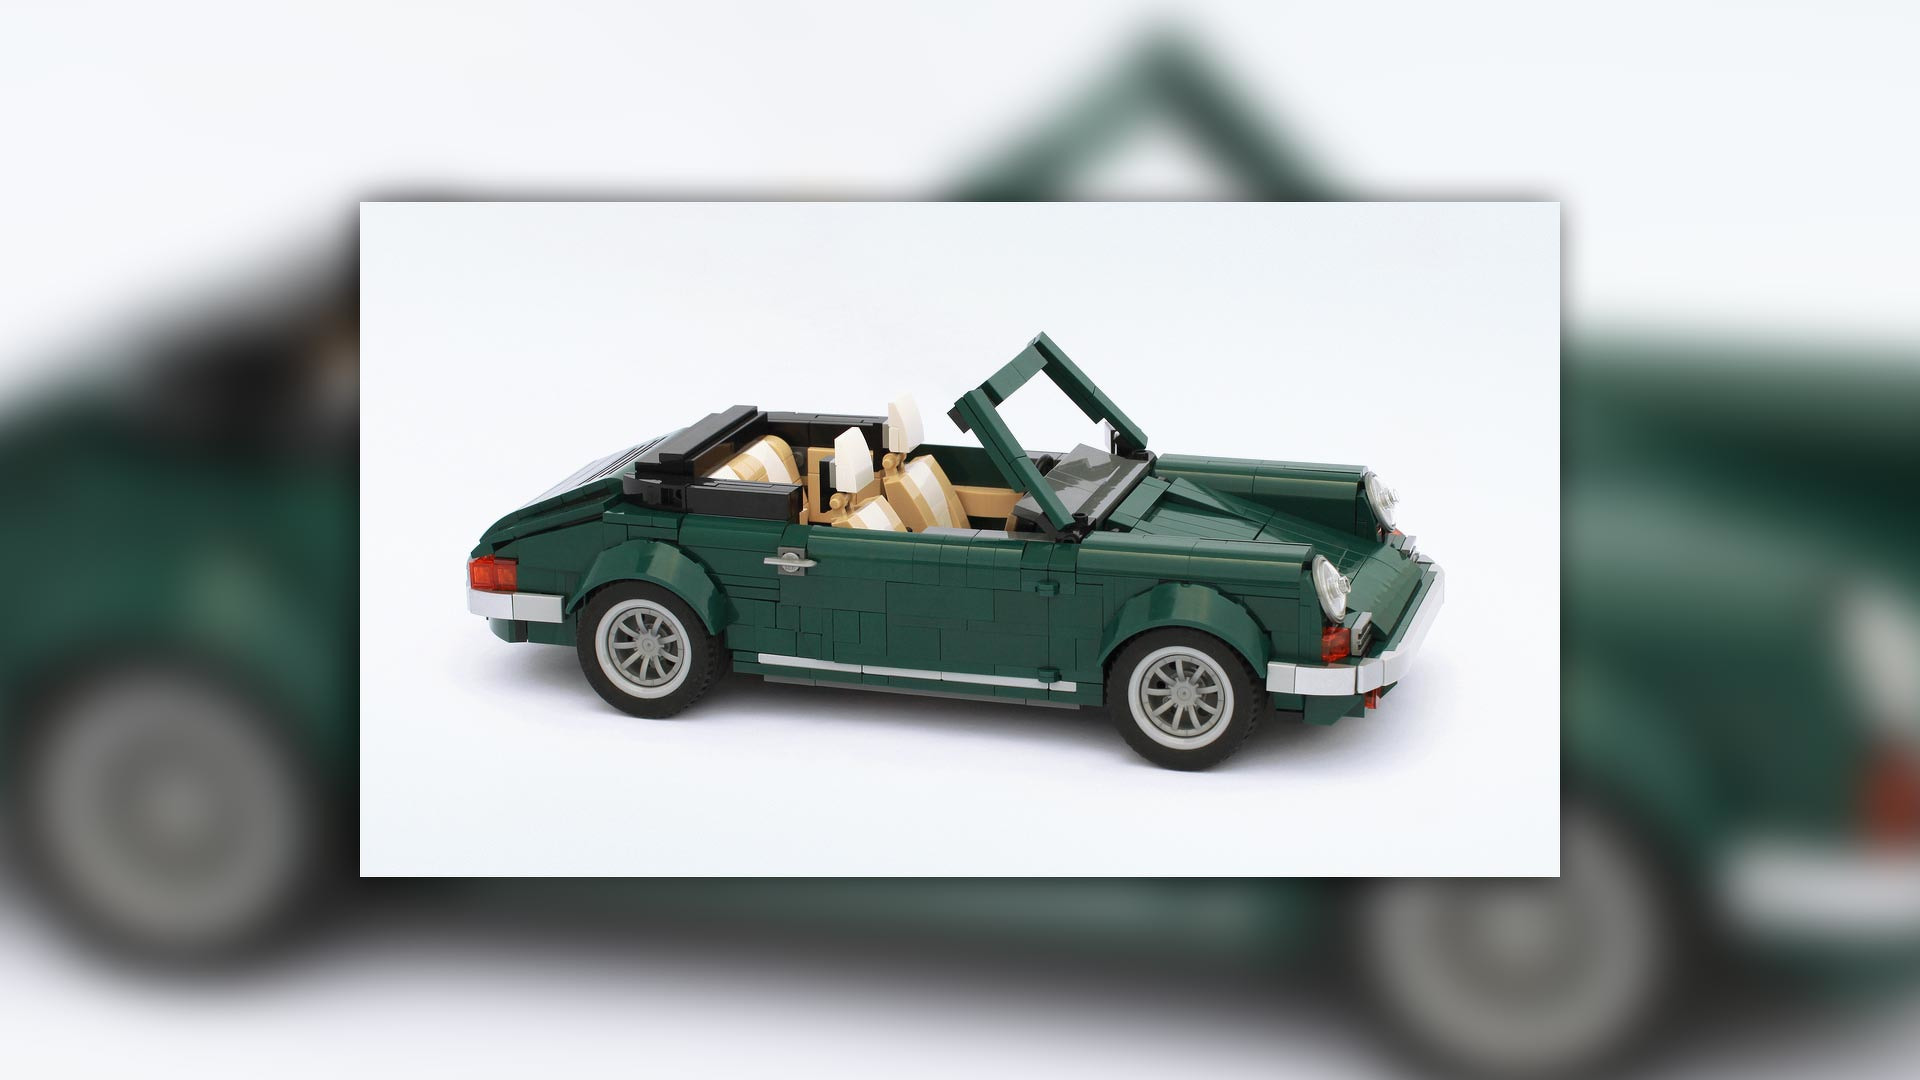 Big Lego Bricks See How A Mini Cooper Lego Kit Spawns A Porsche 911 And